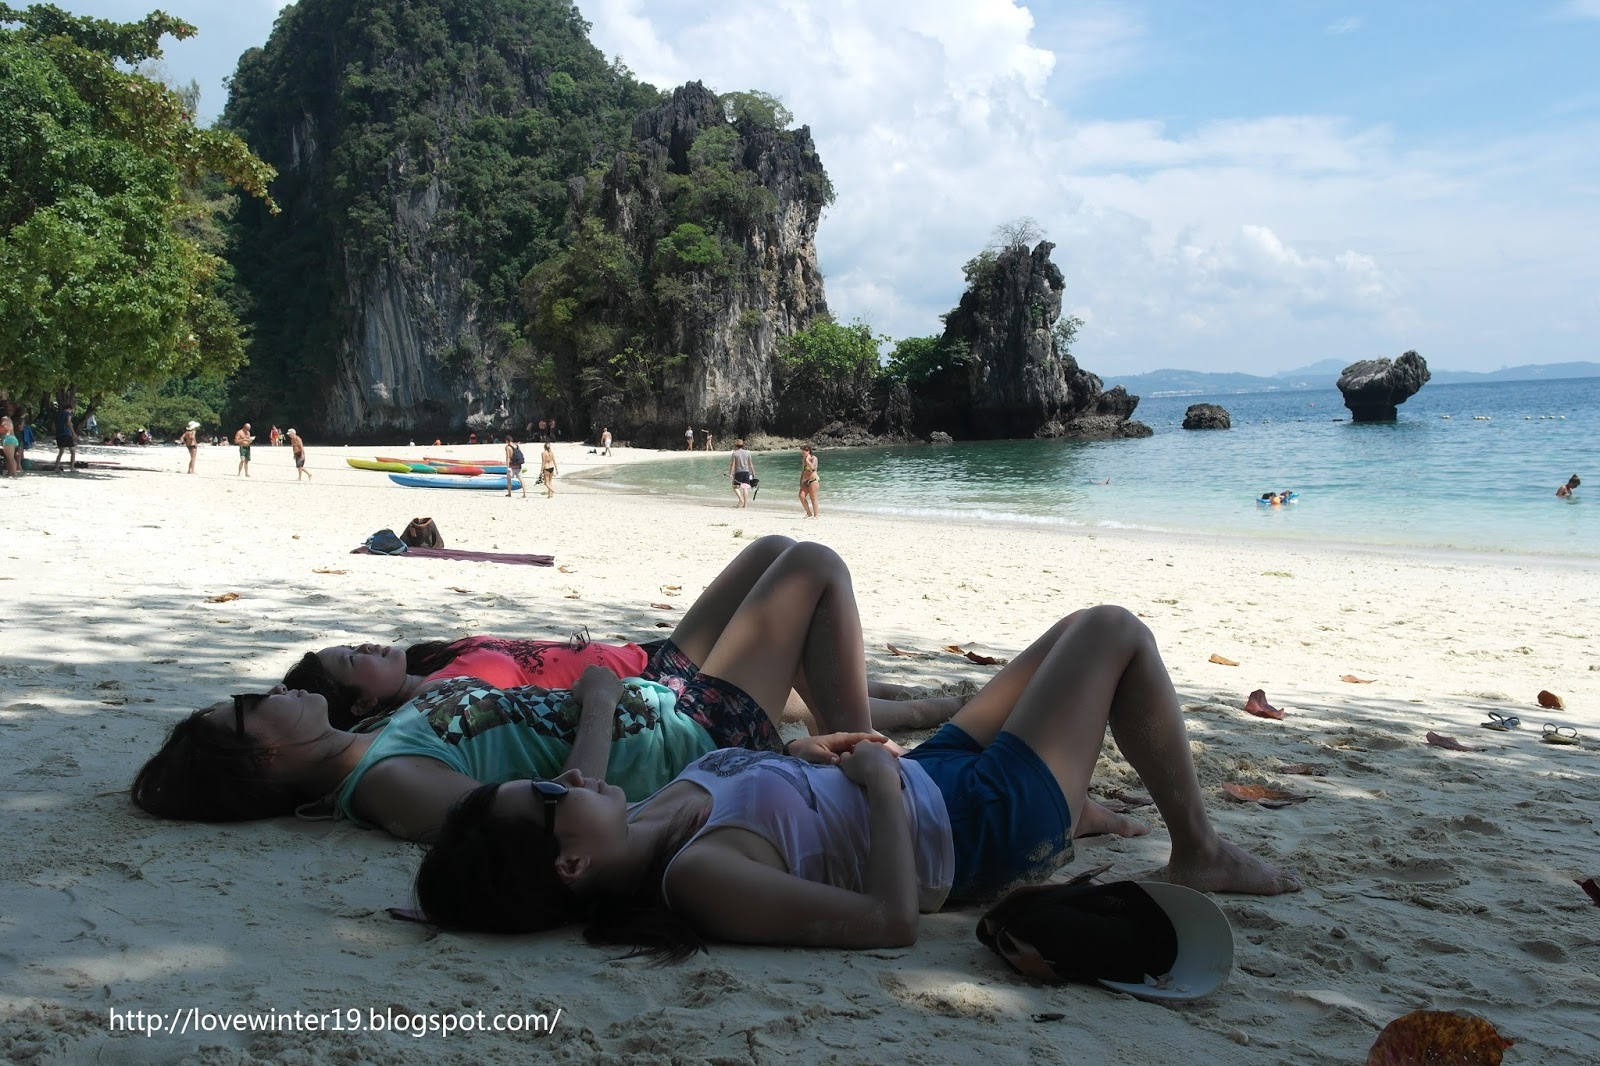 Sun Palace Vacation Rentals Ft Myers Beach Fl